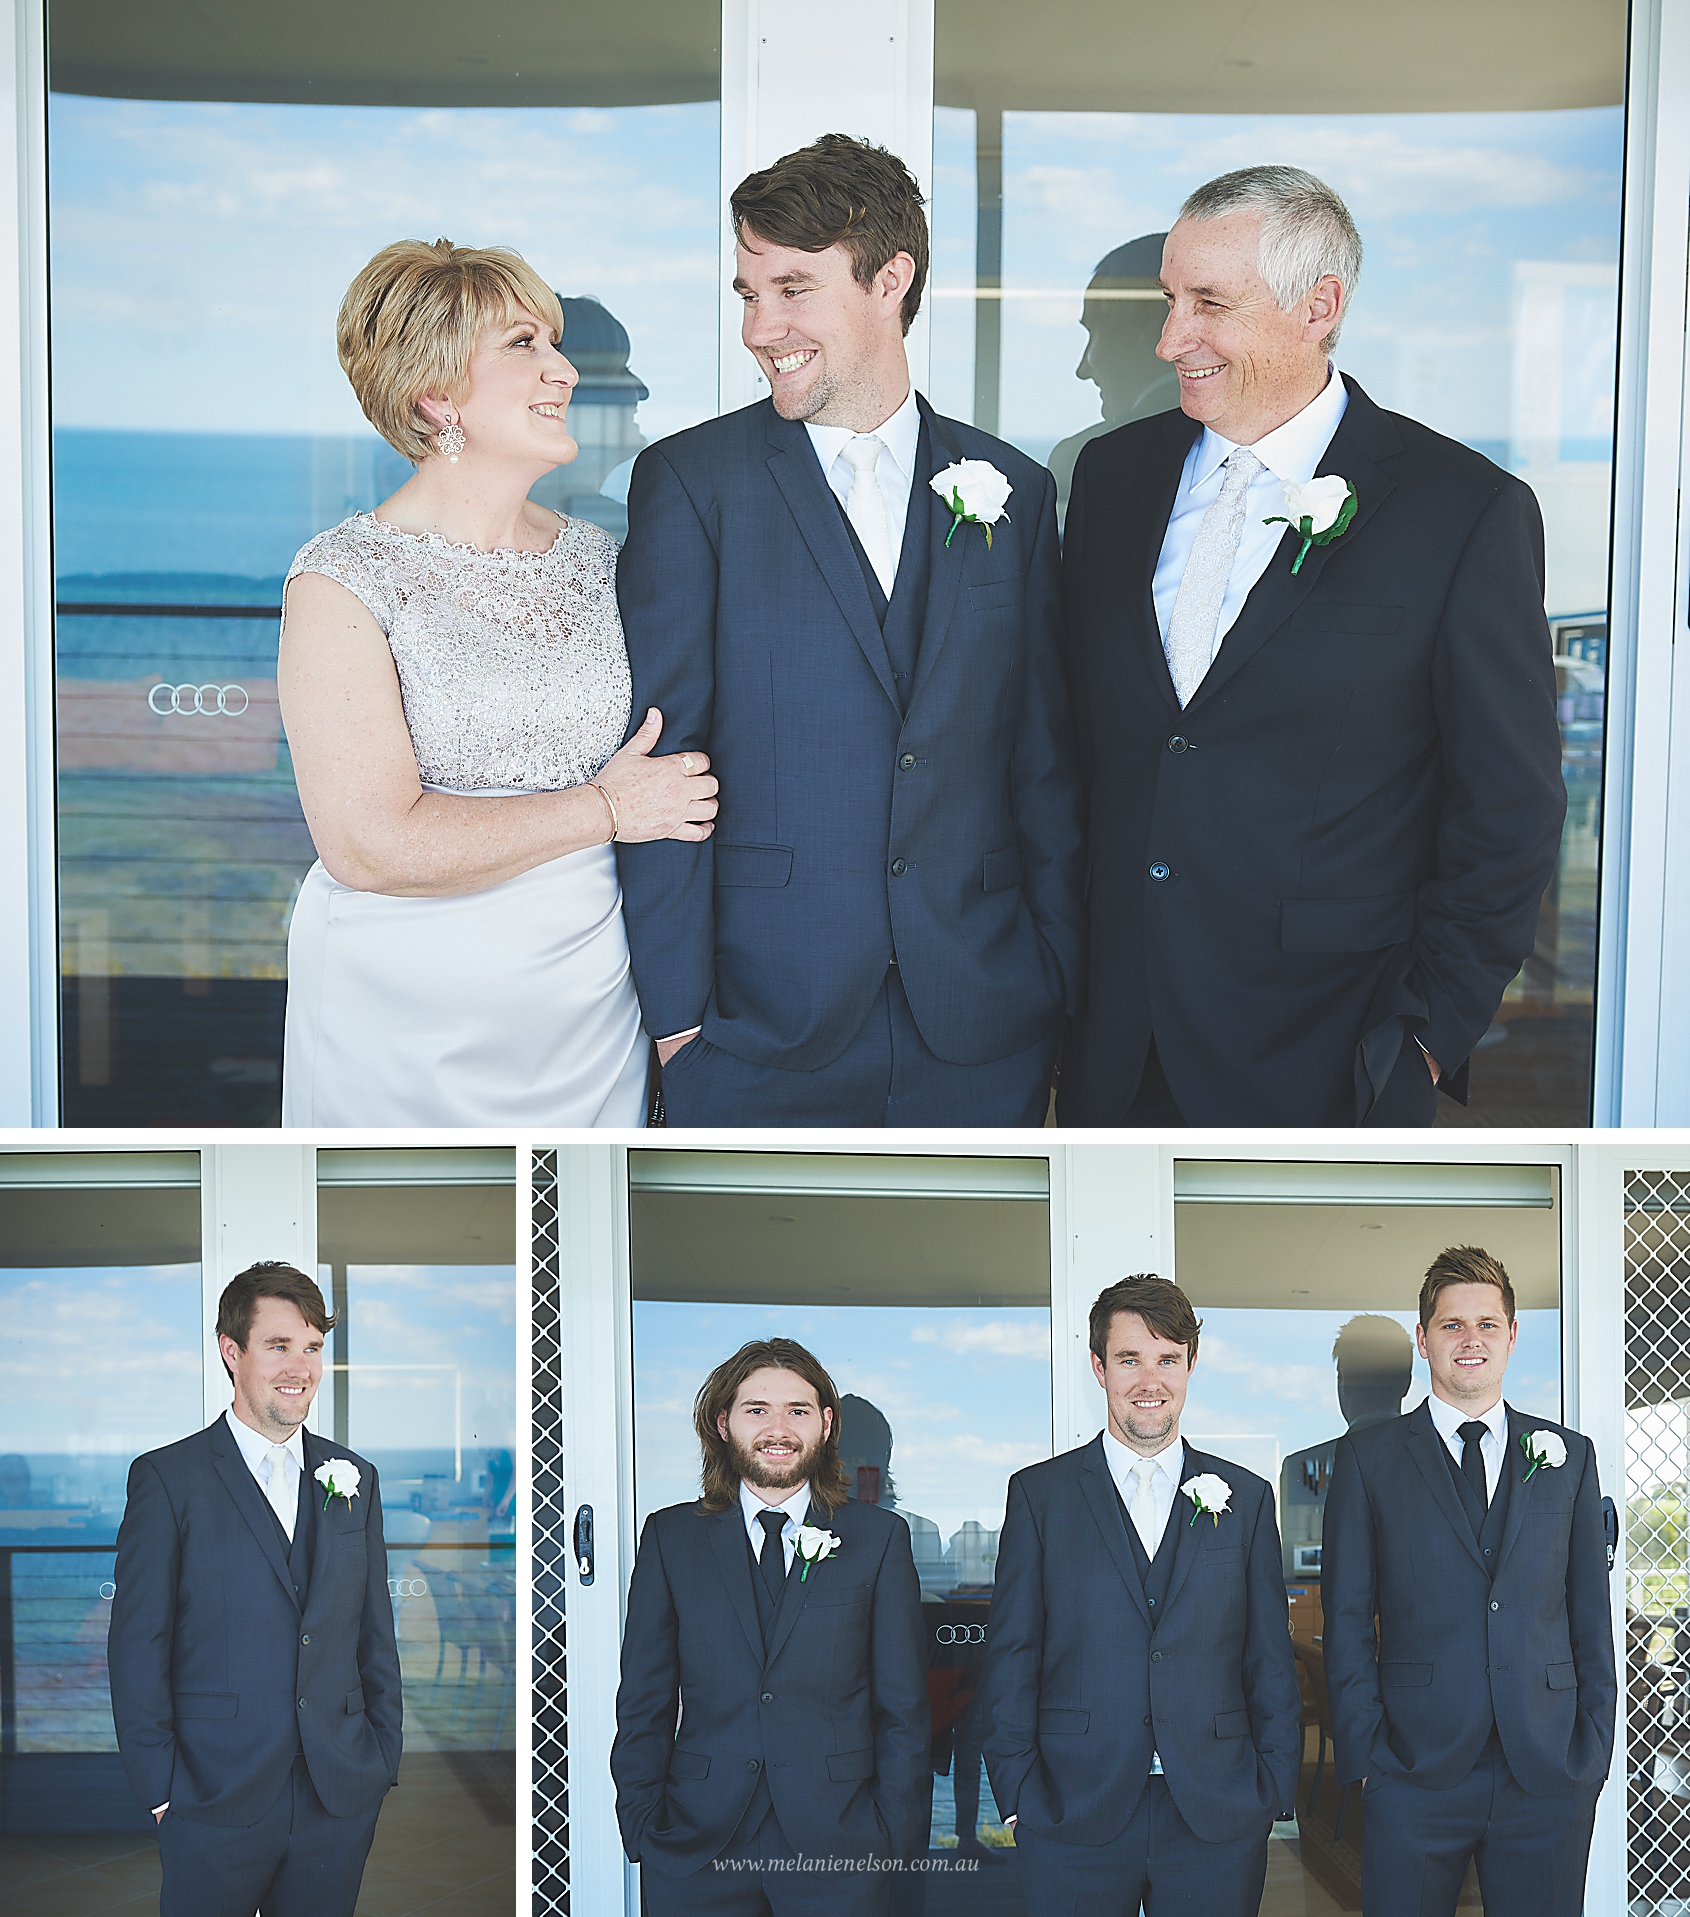 yorke_peninsula_wedding_photographer_0026.jpg